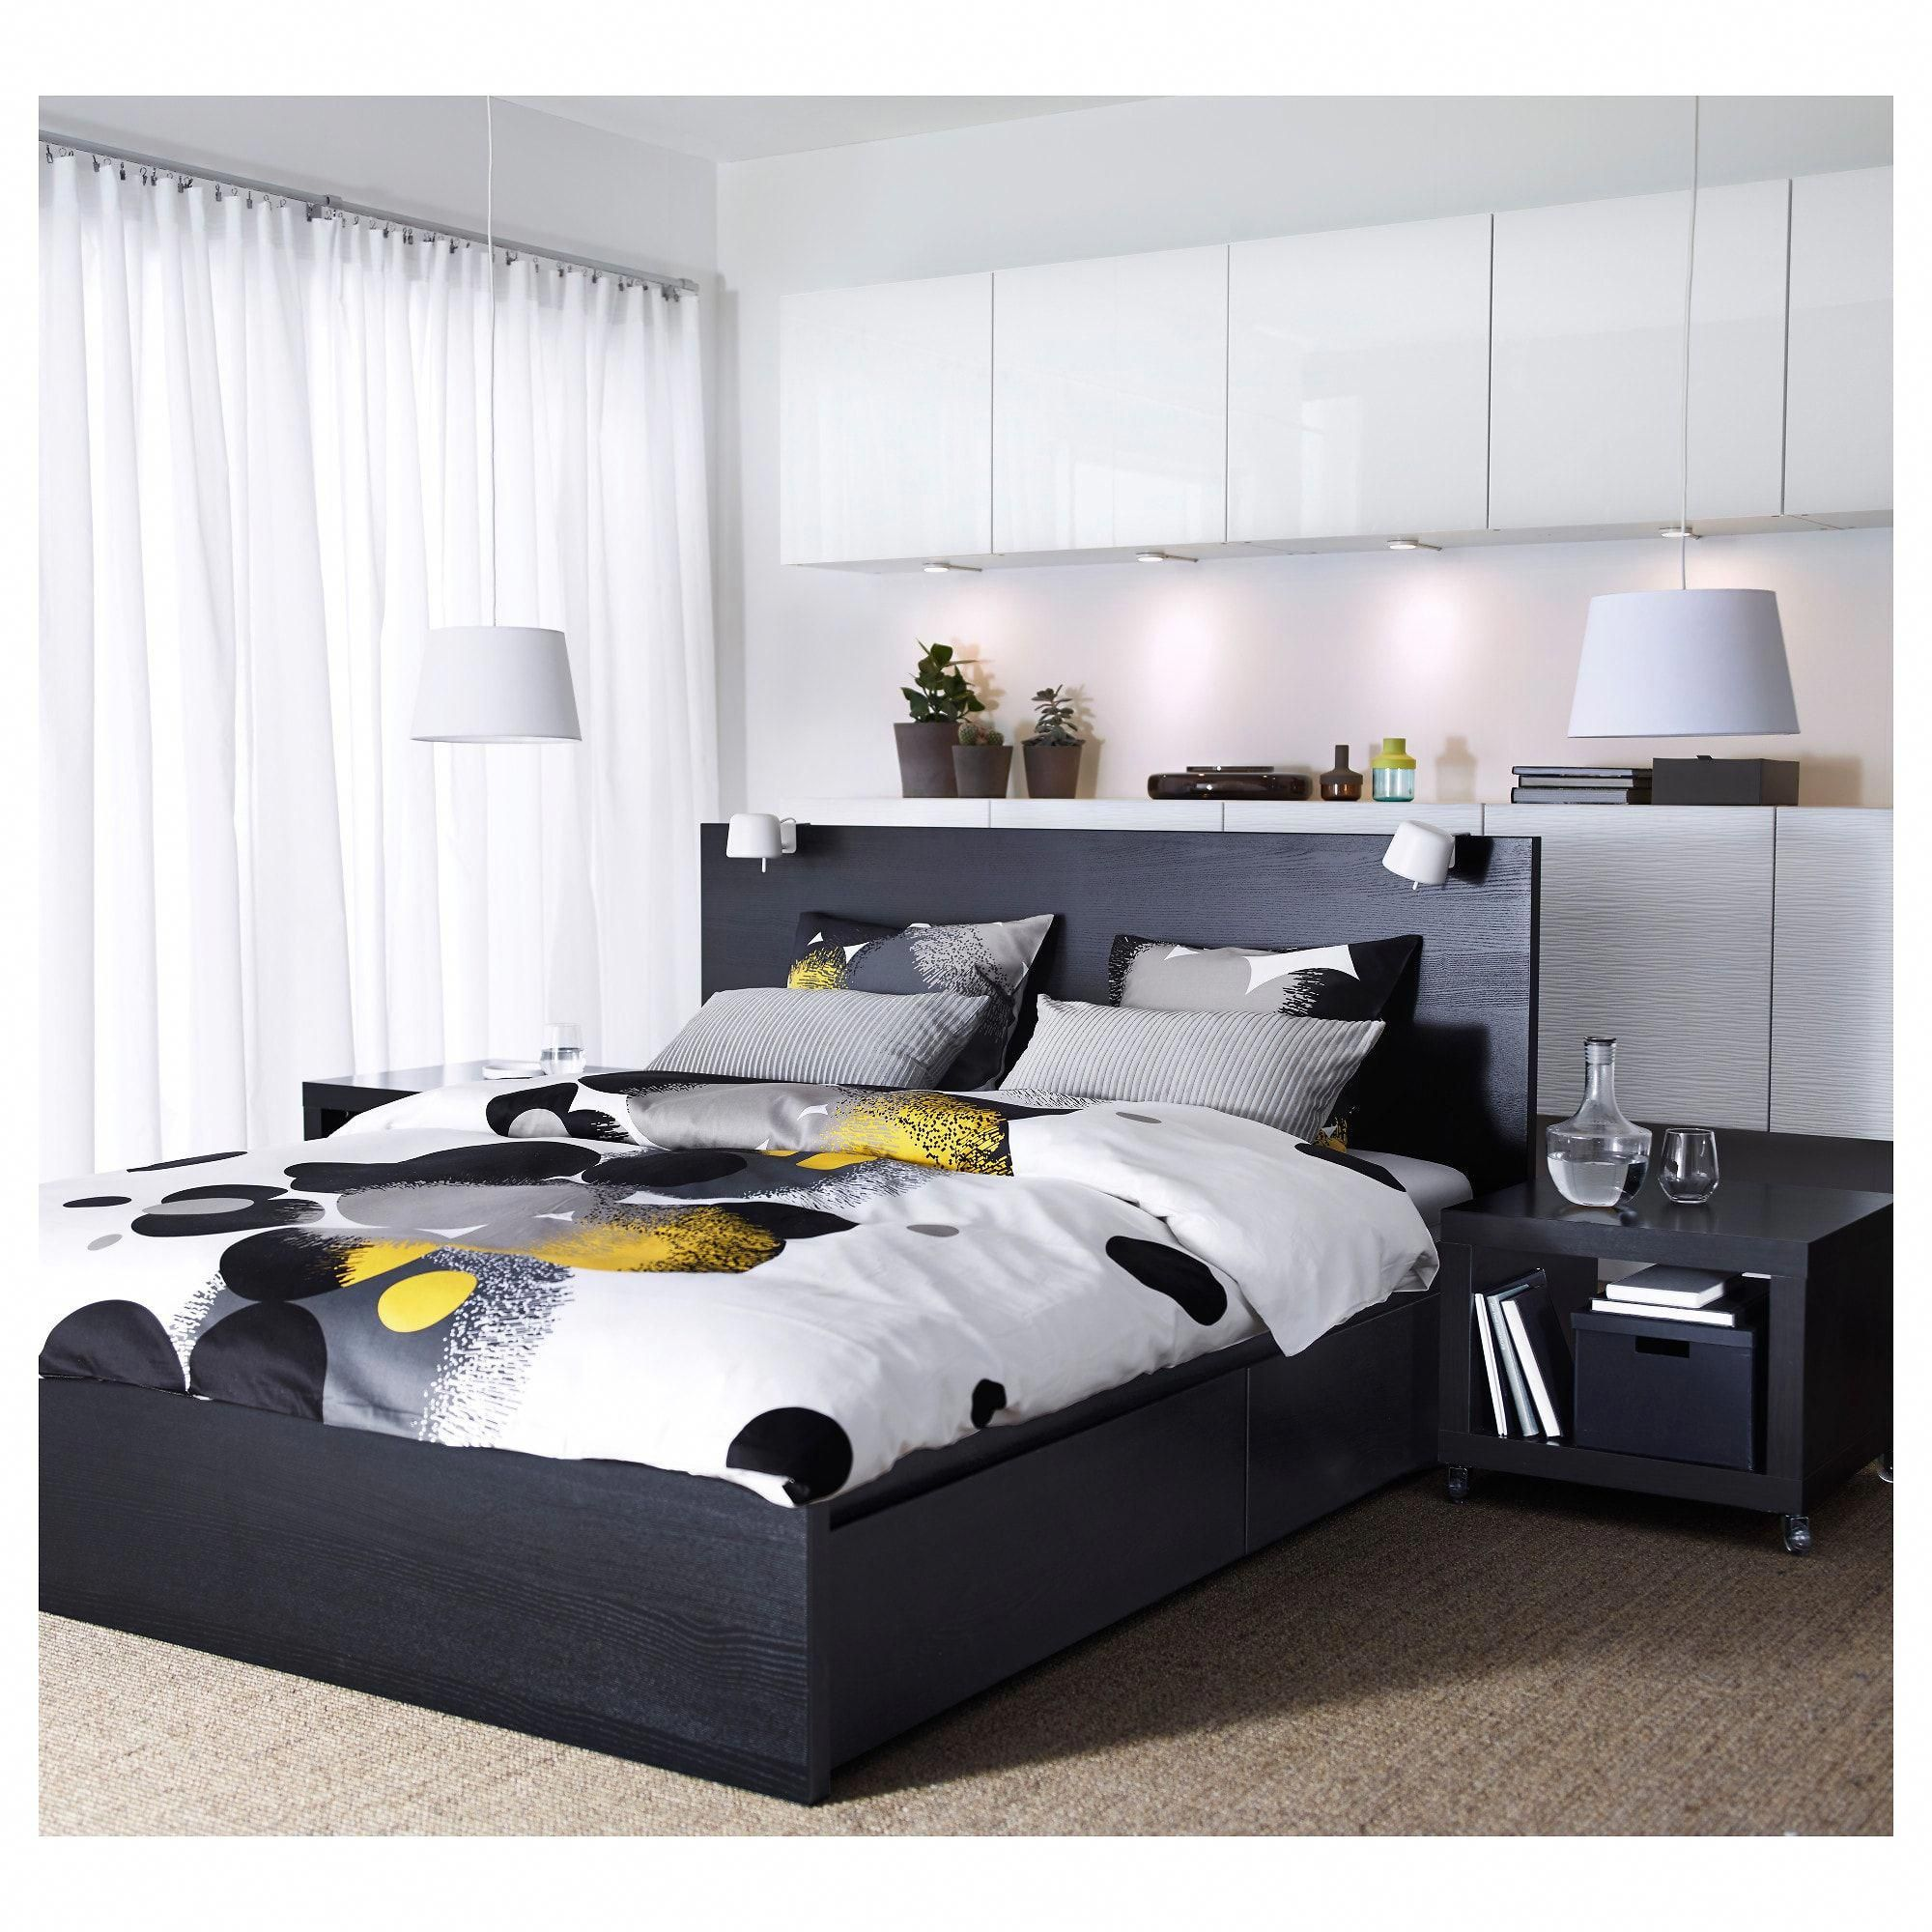 IKEA MALM BlackBrown, Luröy High bed frame/4 storage